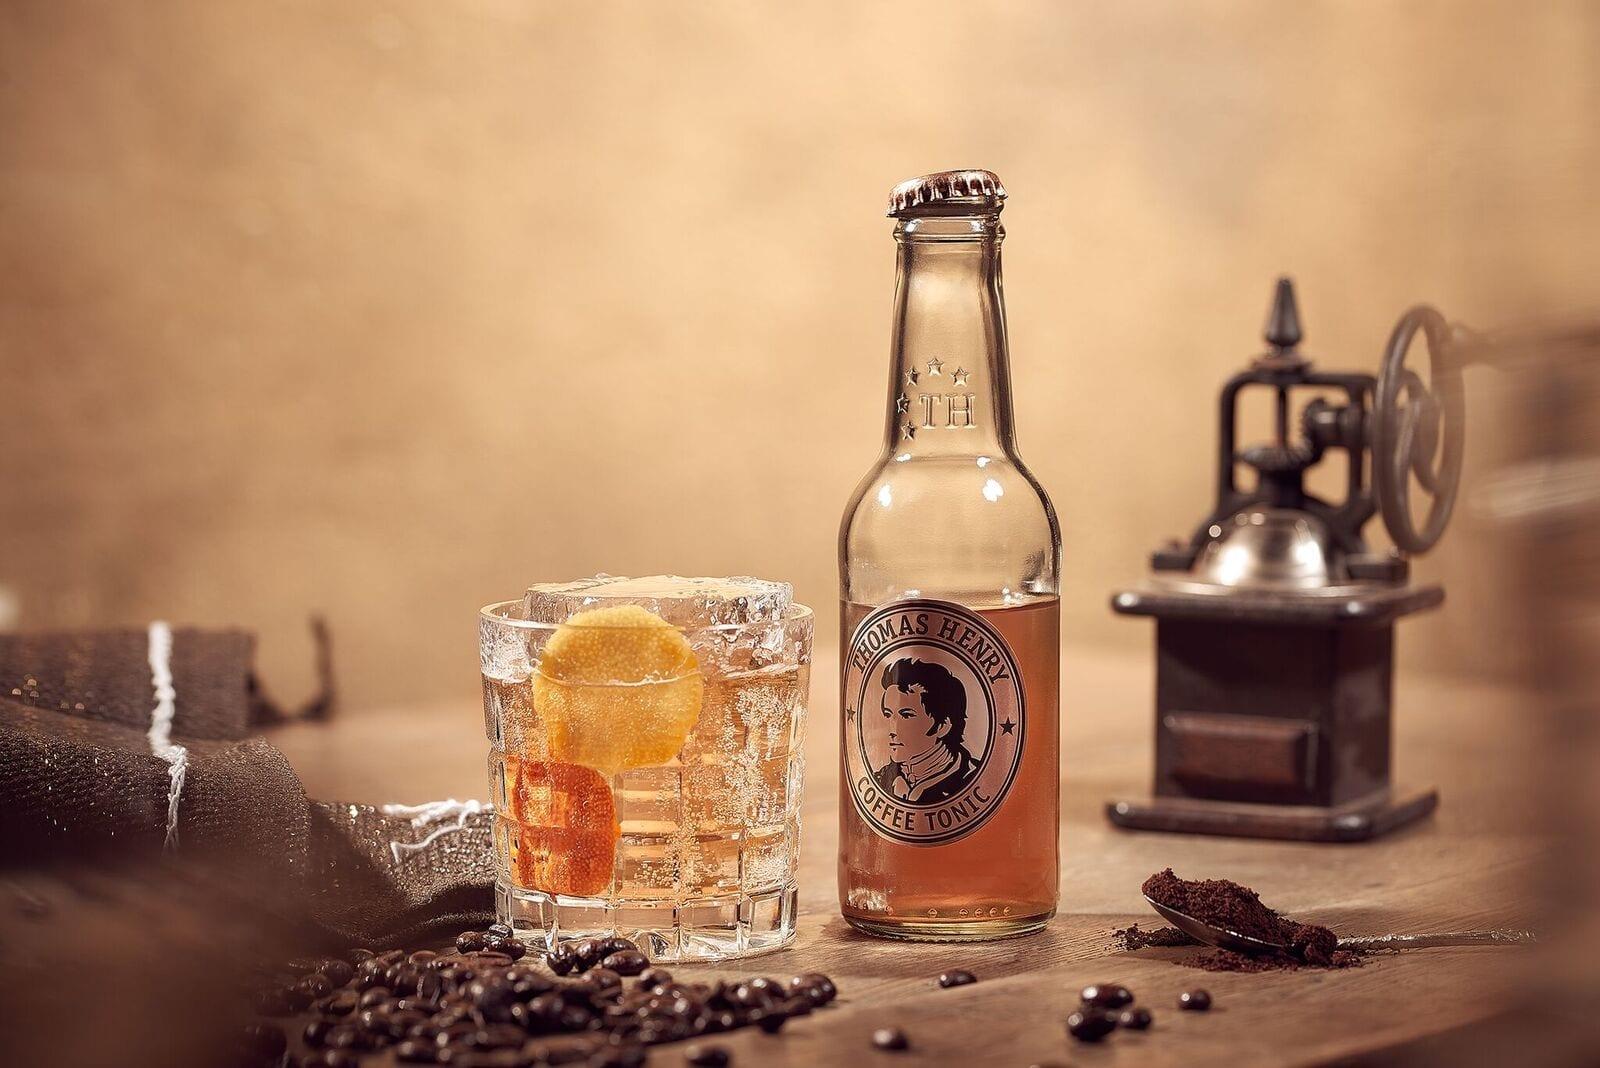 Thomas Henry Coffee Tonic